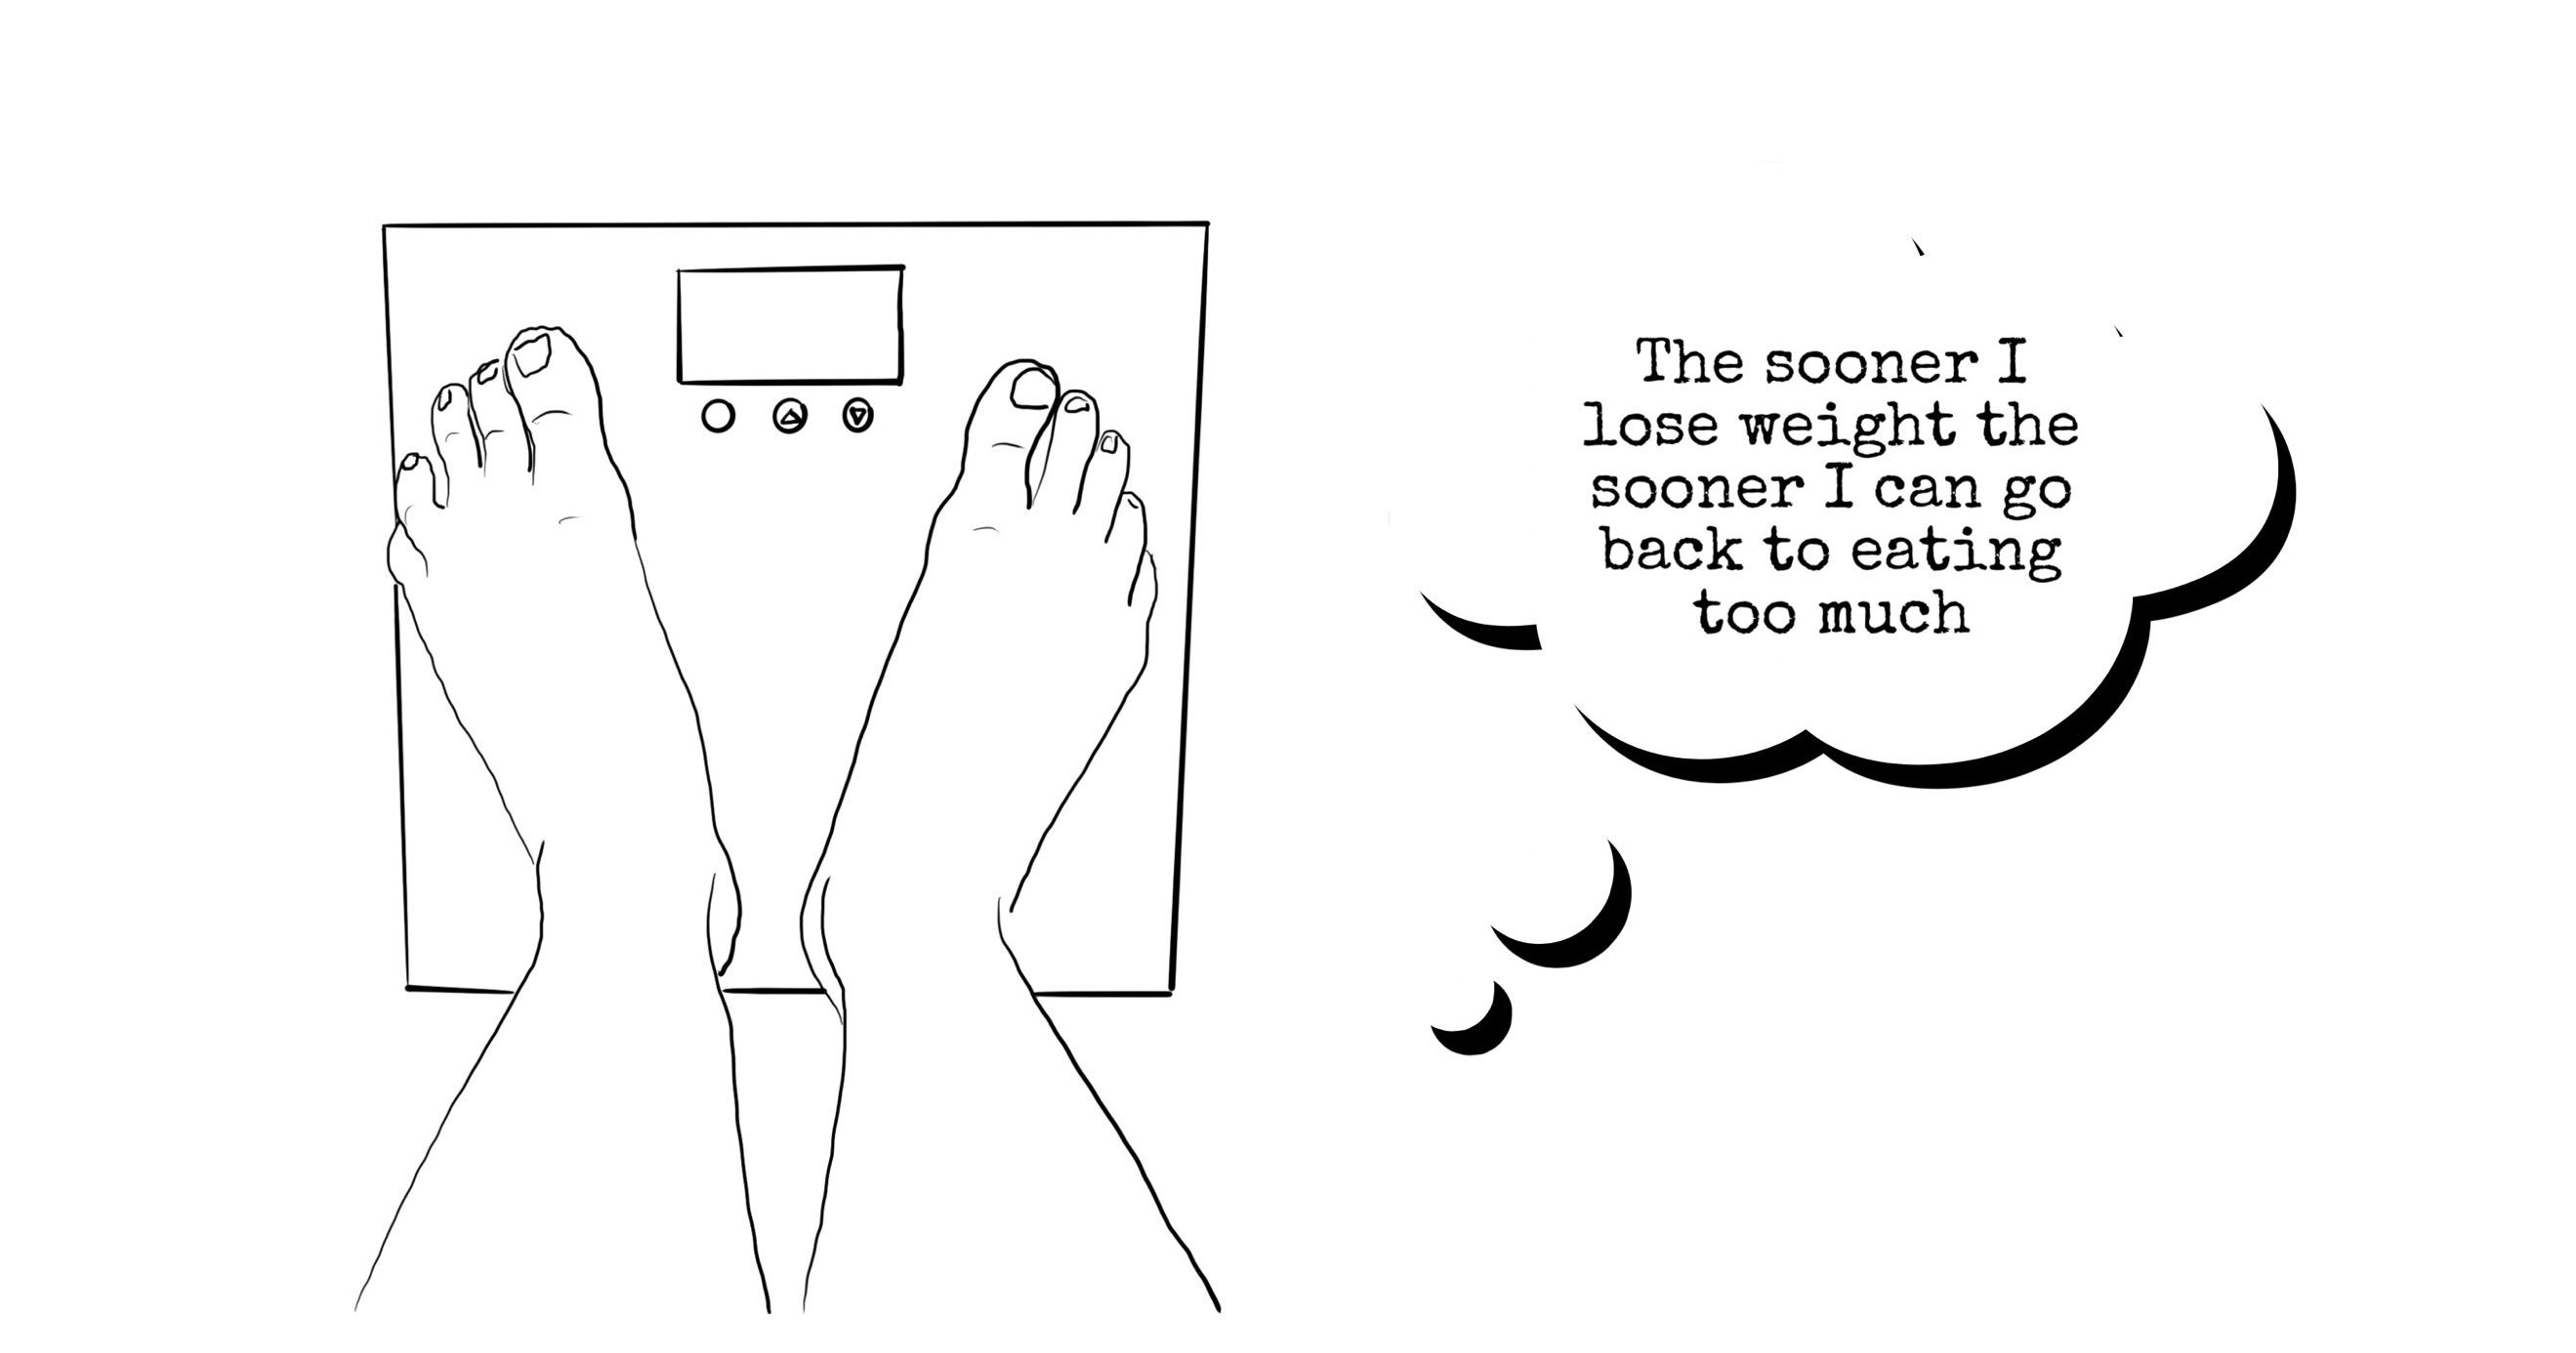 fast weight loss, weight gain, crash diet, yo-yo dieting, binge, serial starter, biggest loser,